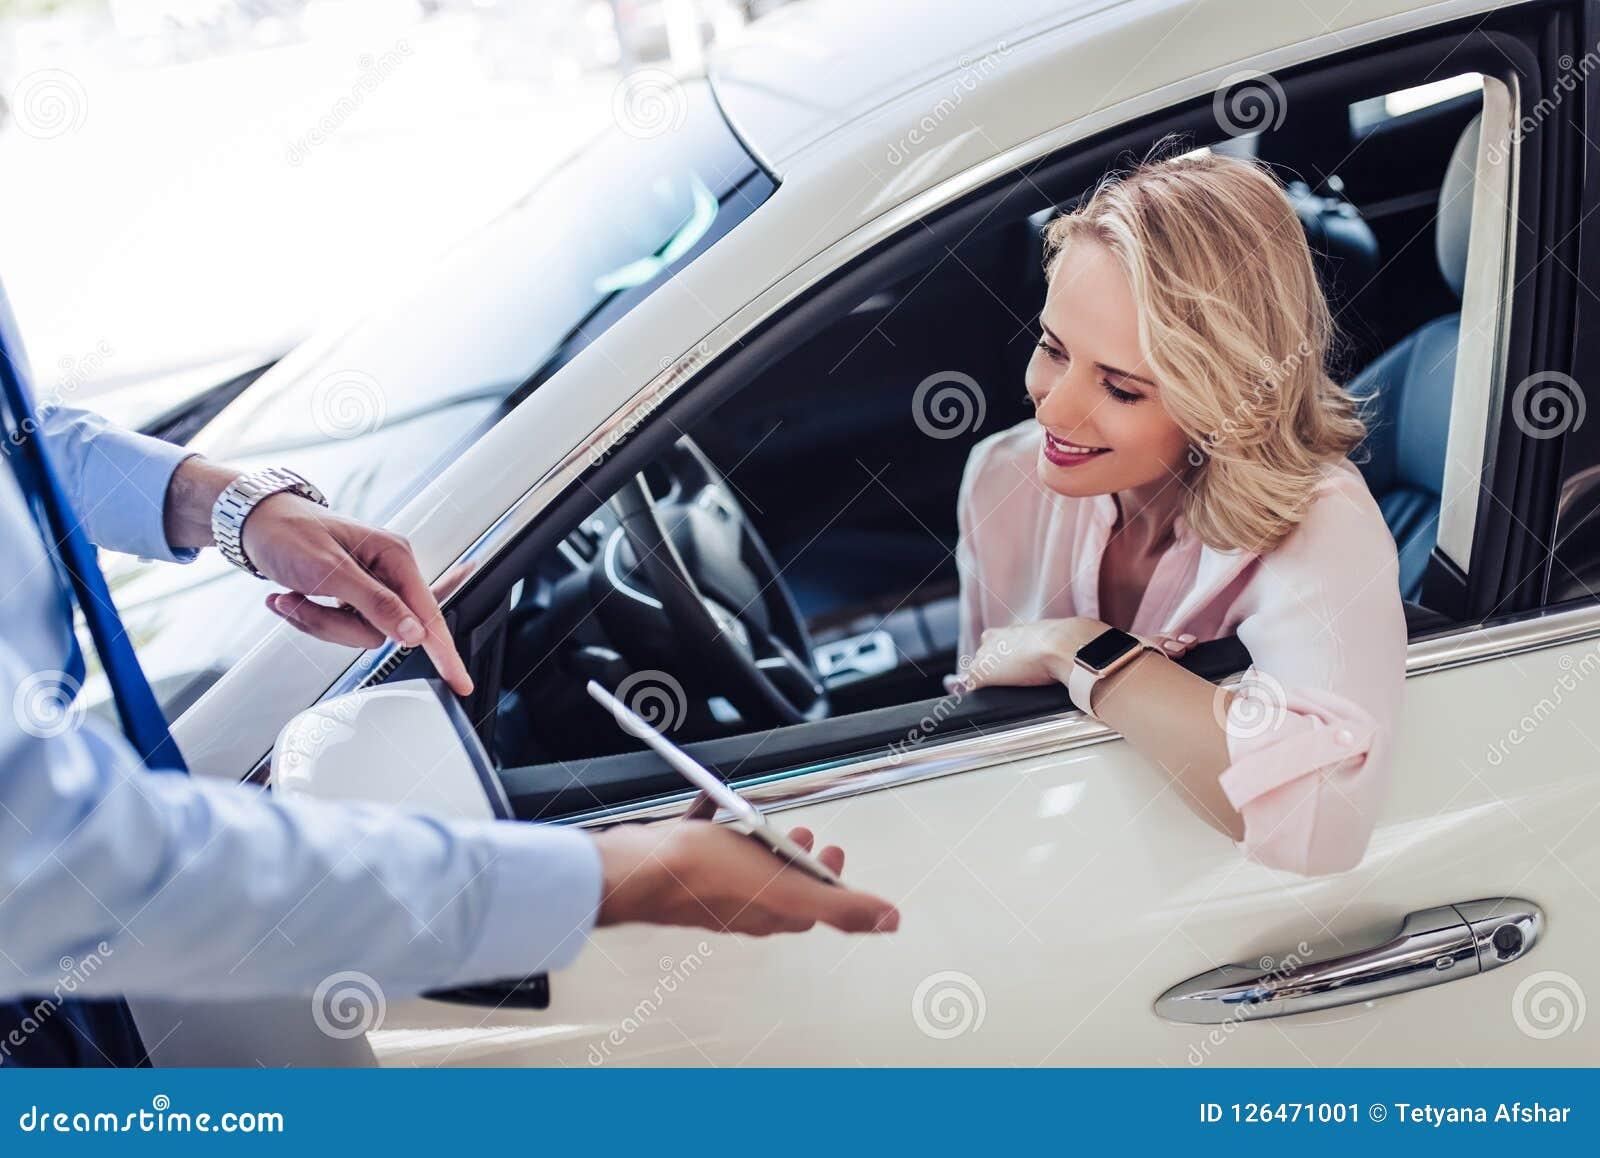 Salesman showing woman something on digital tablet